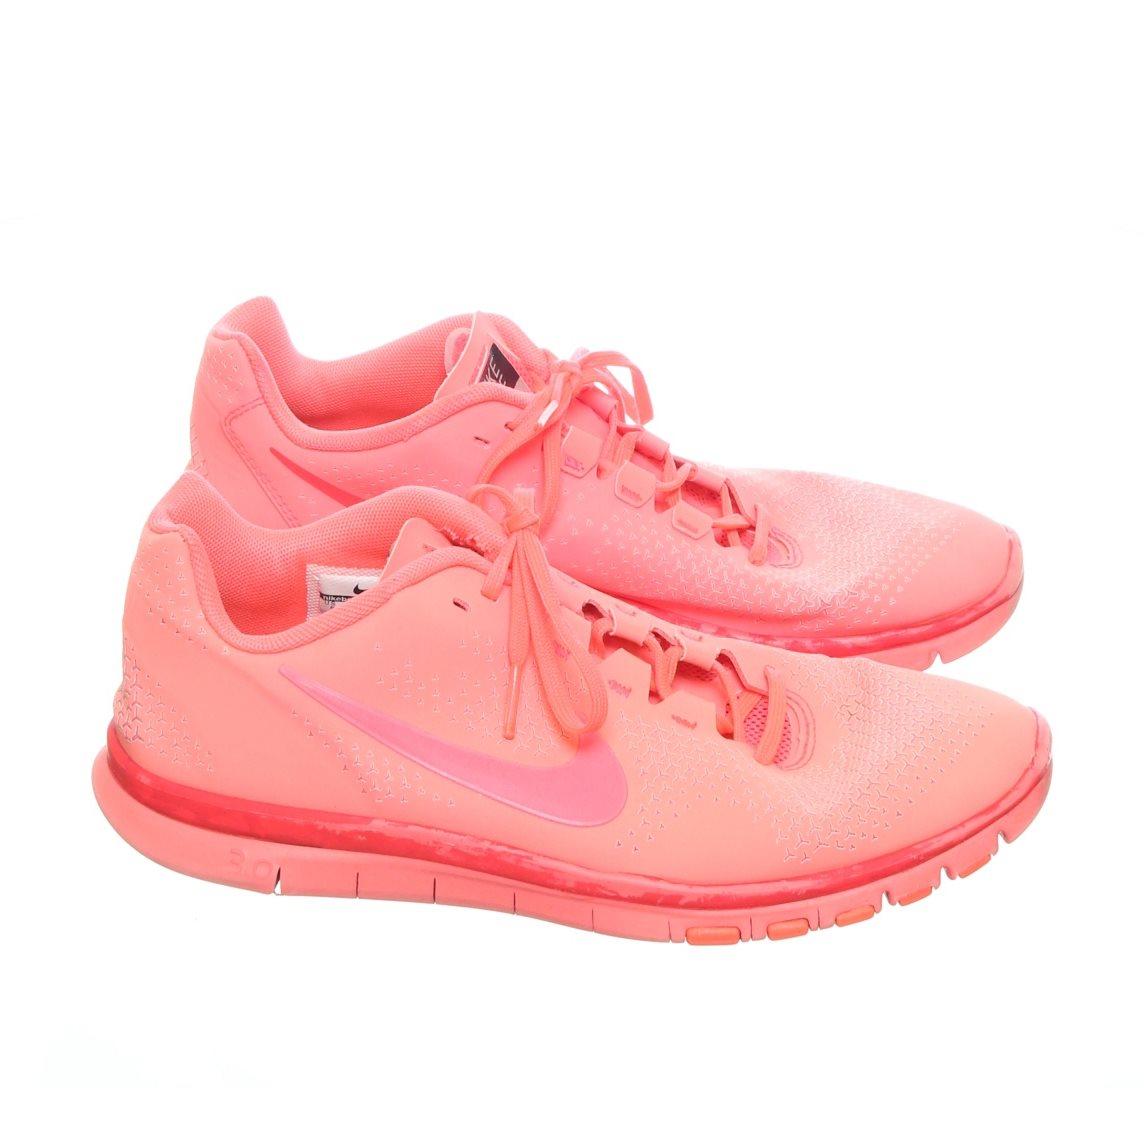 super popular 5f4e4 cd18e Nike Free, Träningsskor, Strl 39, Advantage 3.0 Hot Punch Red 2012,